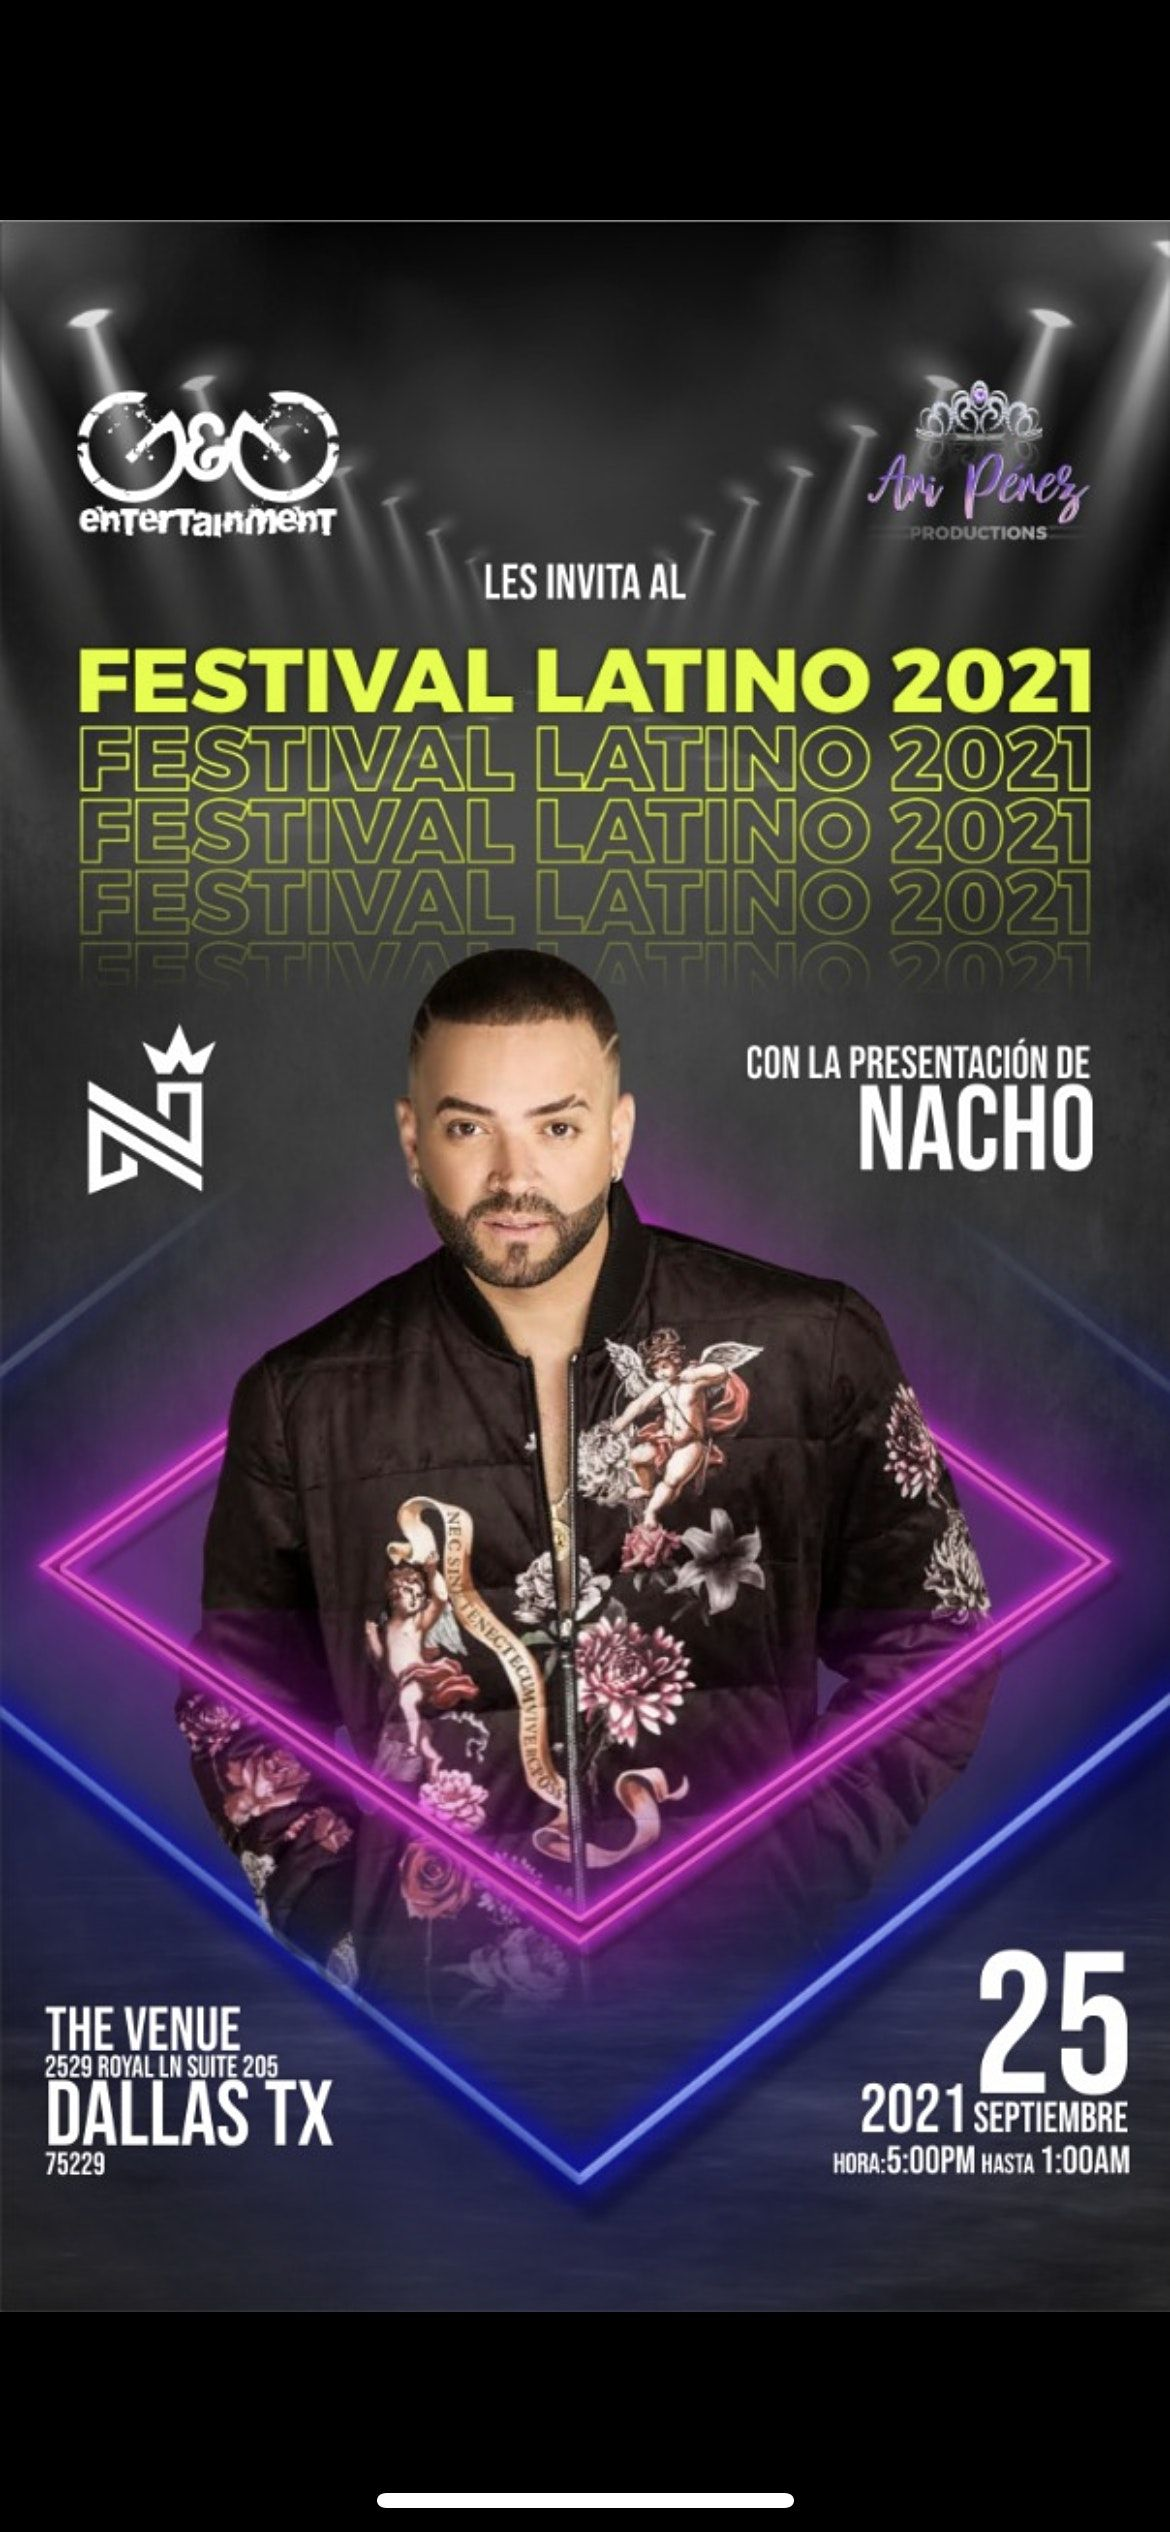 FESTIVAL LATINO FEATURING NACHO